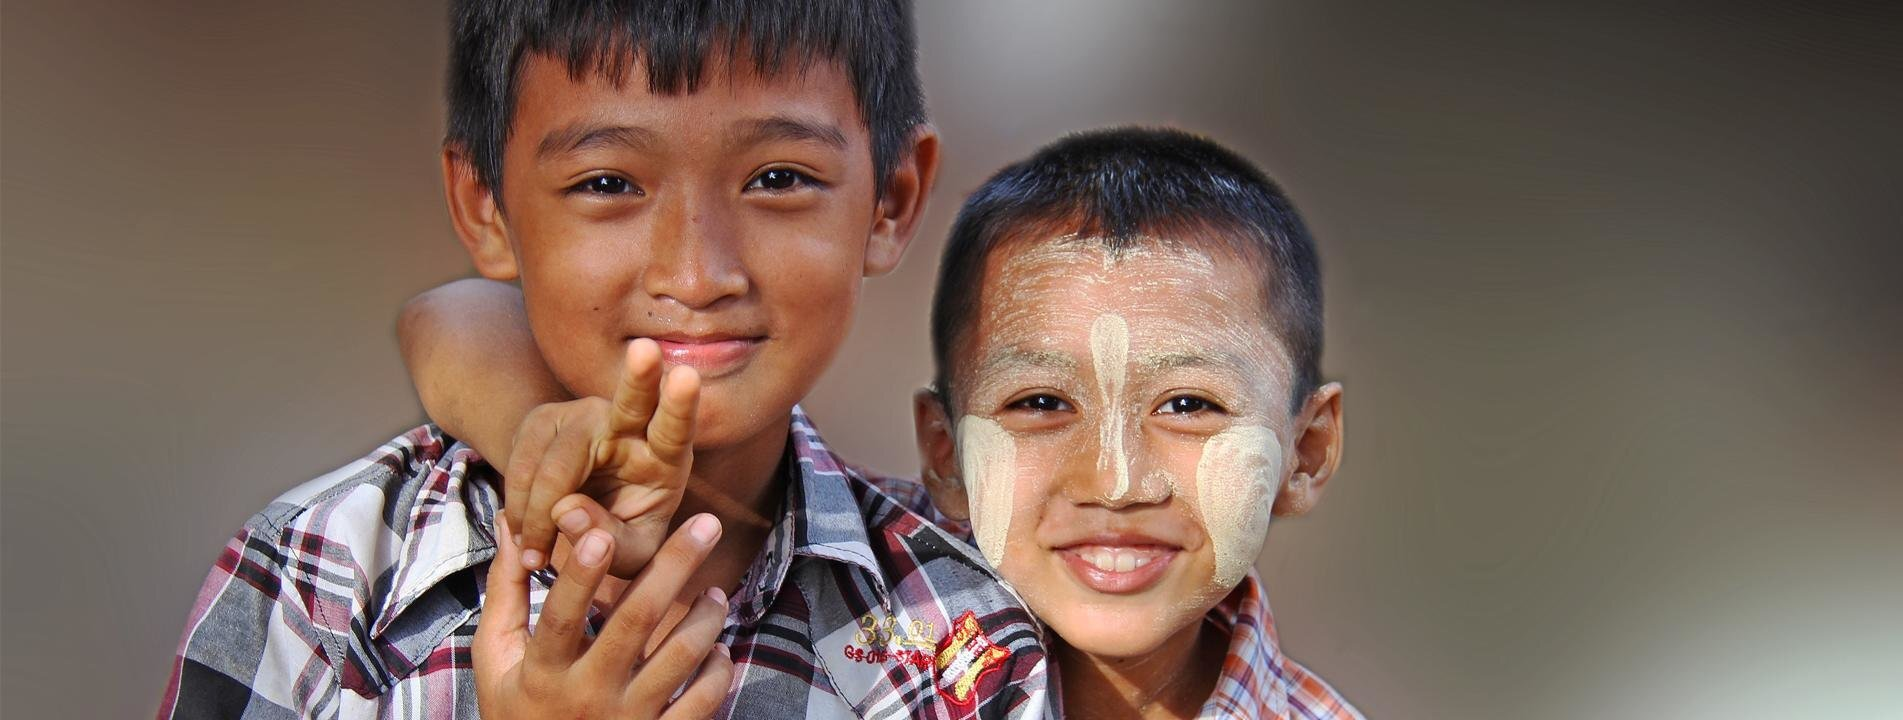 Two Burmese kids welcoming you